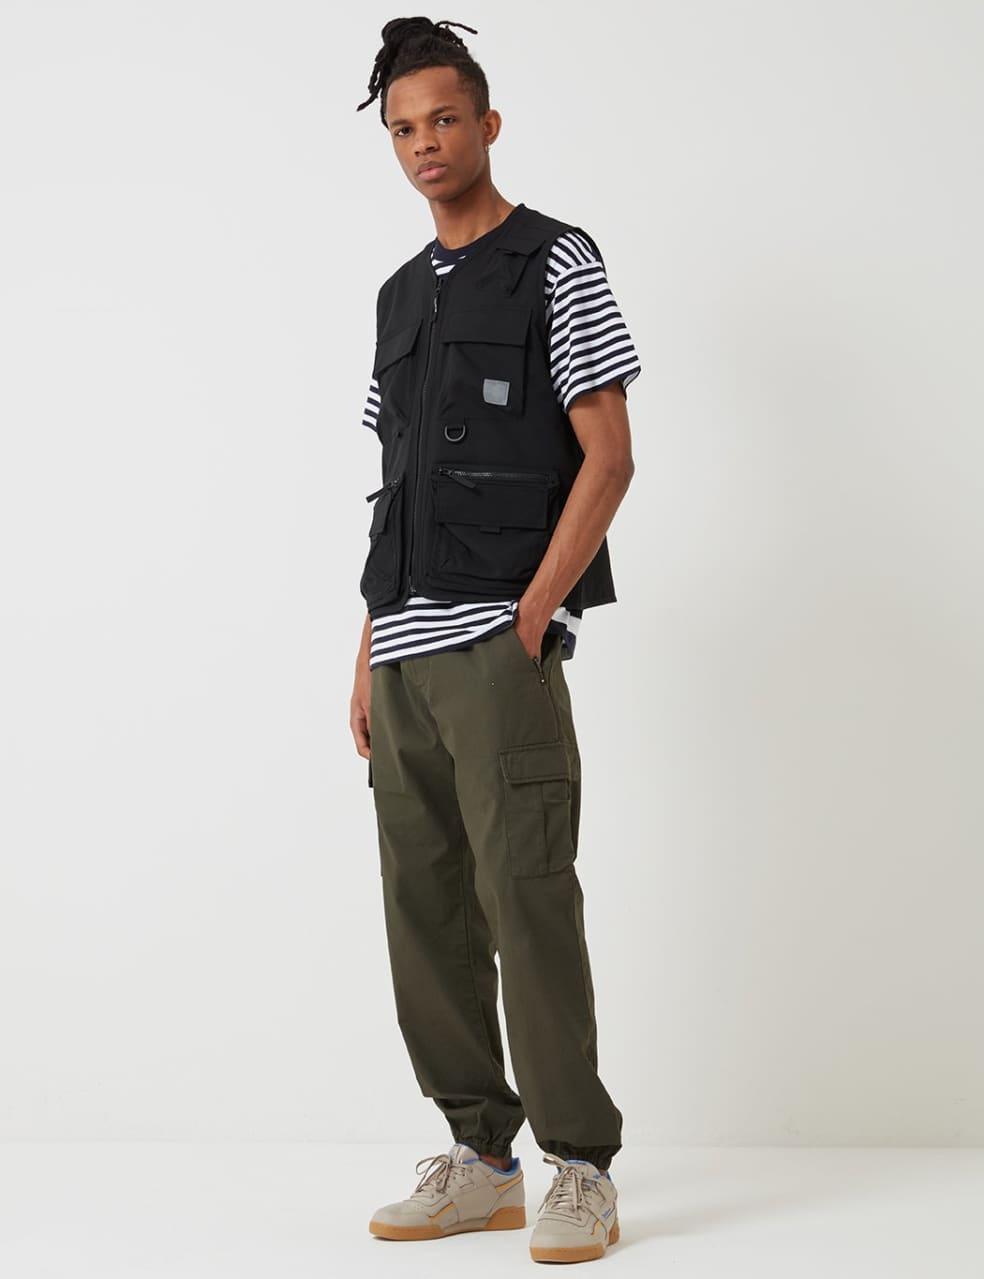 Carhartt-WIP Elmwood Vest (Stretch) - Black | Gilet by Carhartt WIP 3